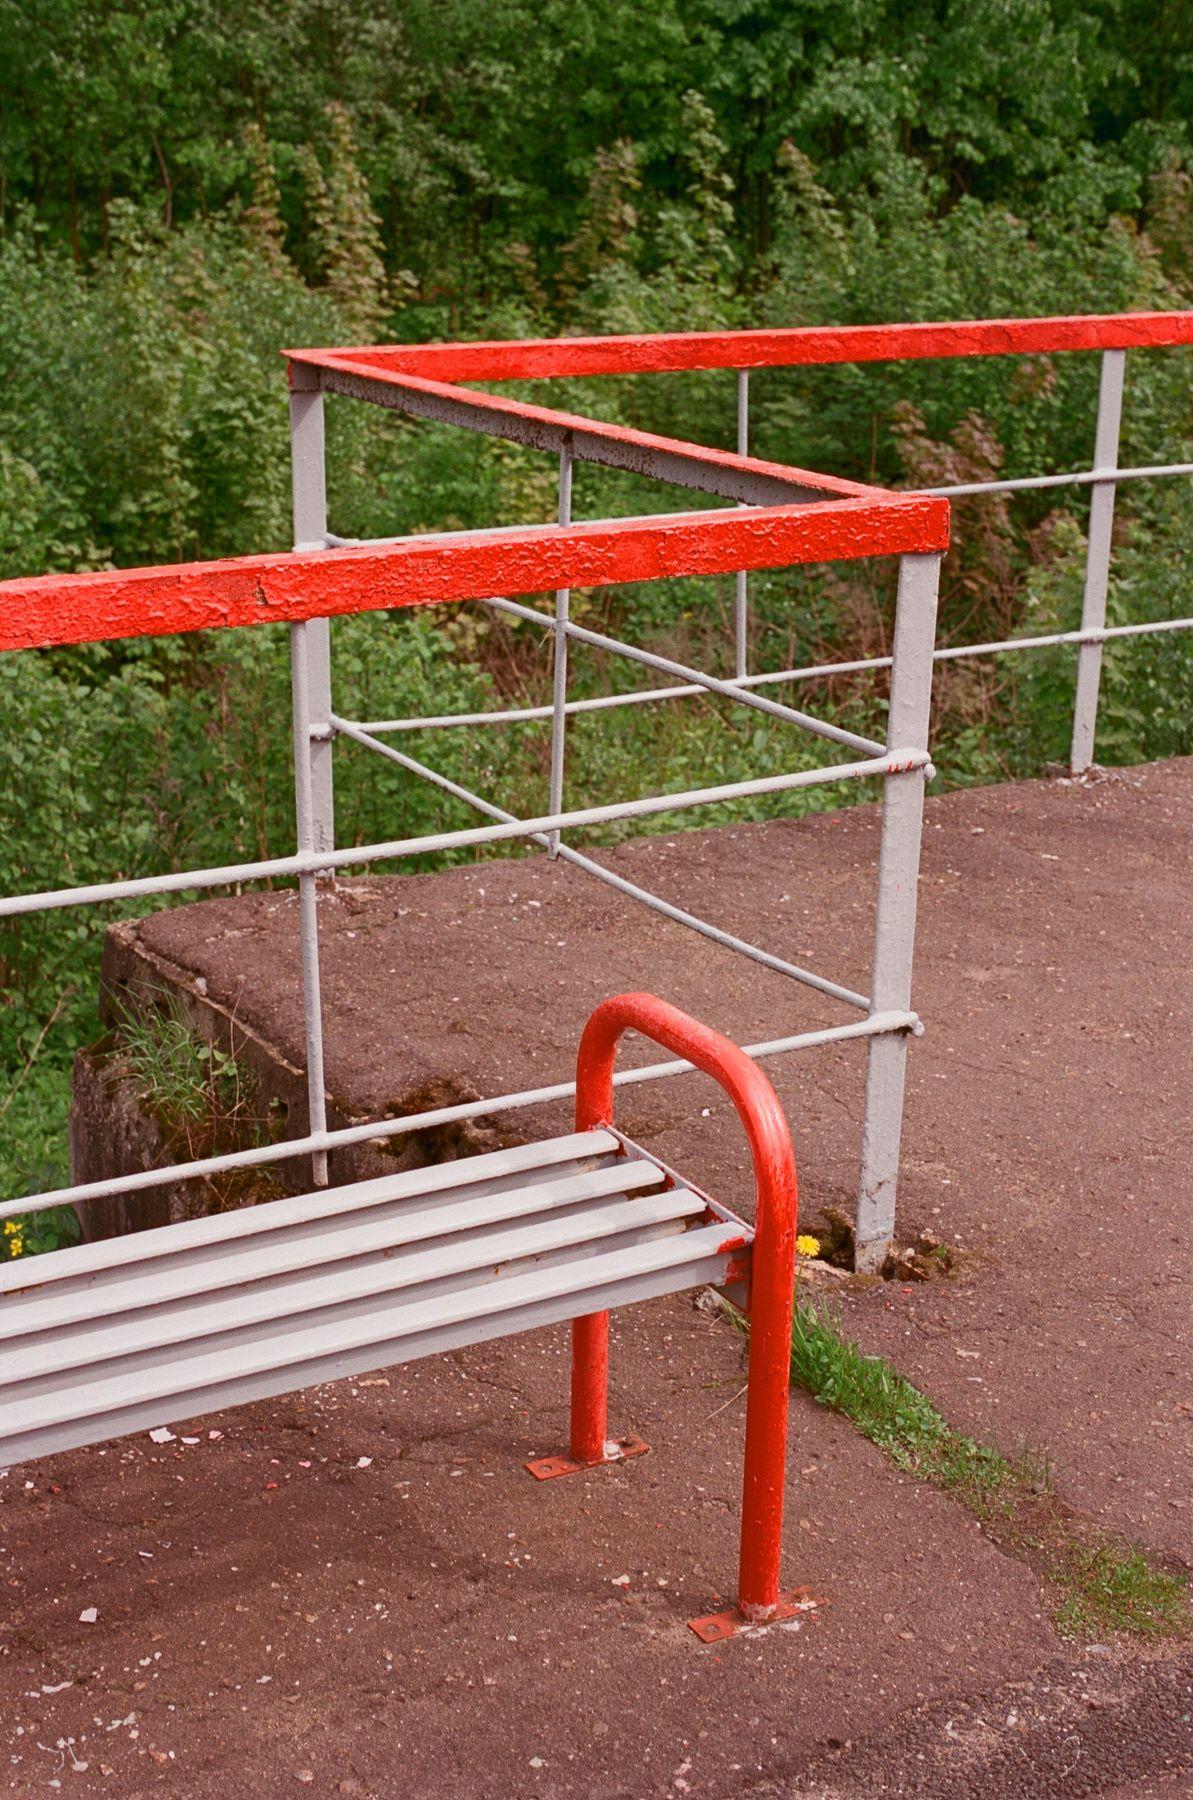 РЖД. Станция 92 километр Leica m3 Kodak Aerocolorпленка summilux 50mm 1.4